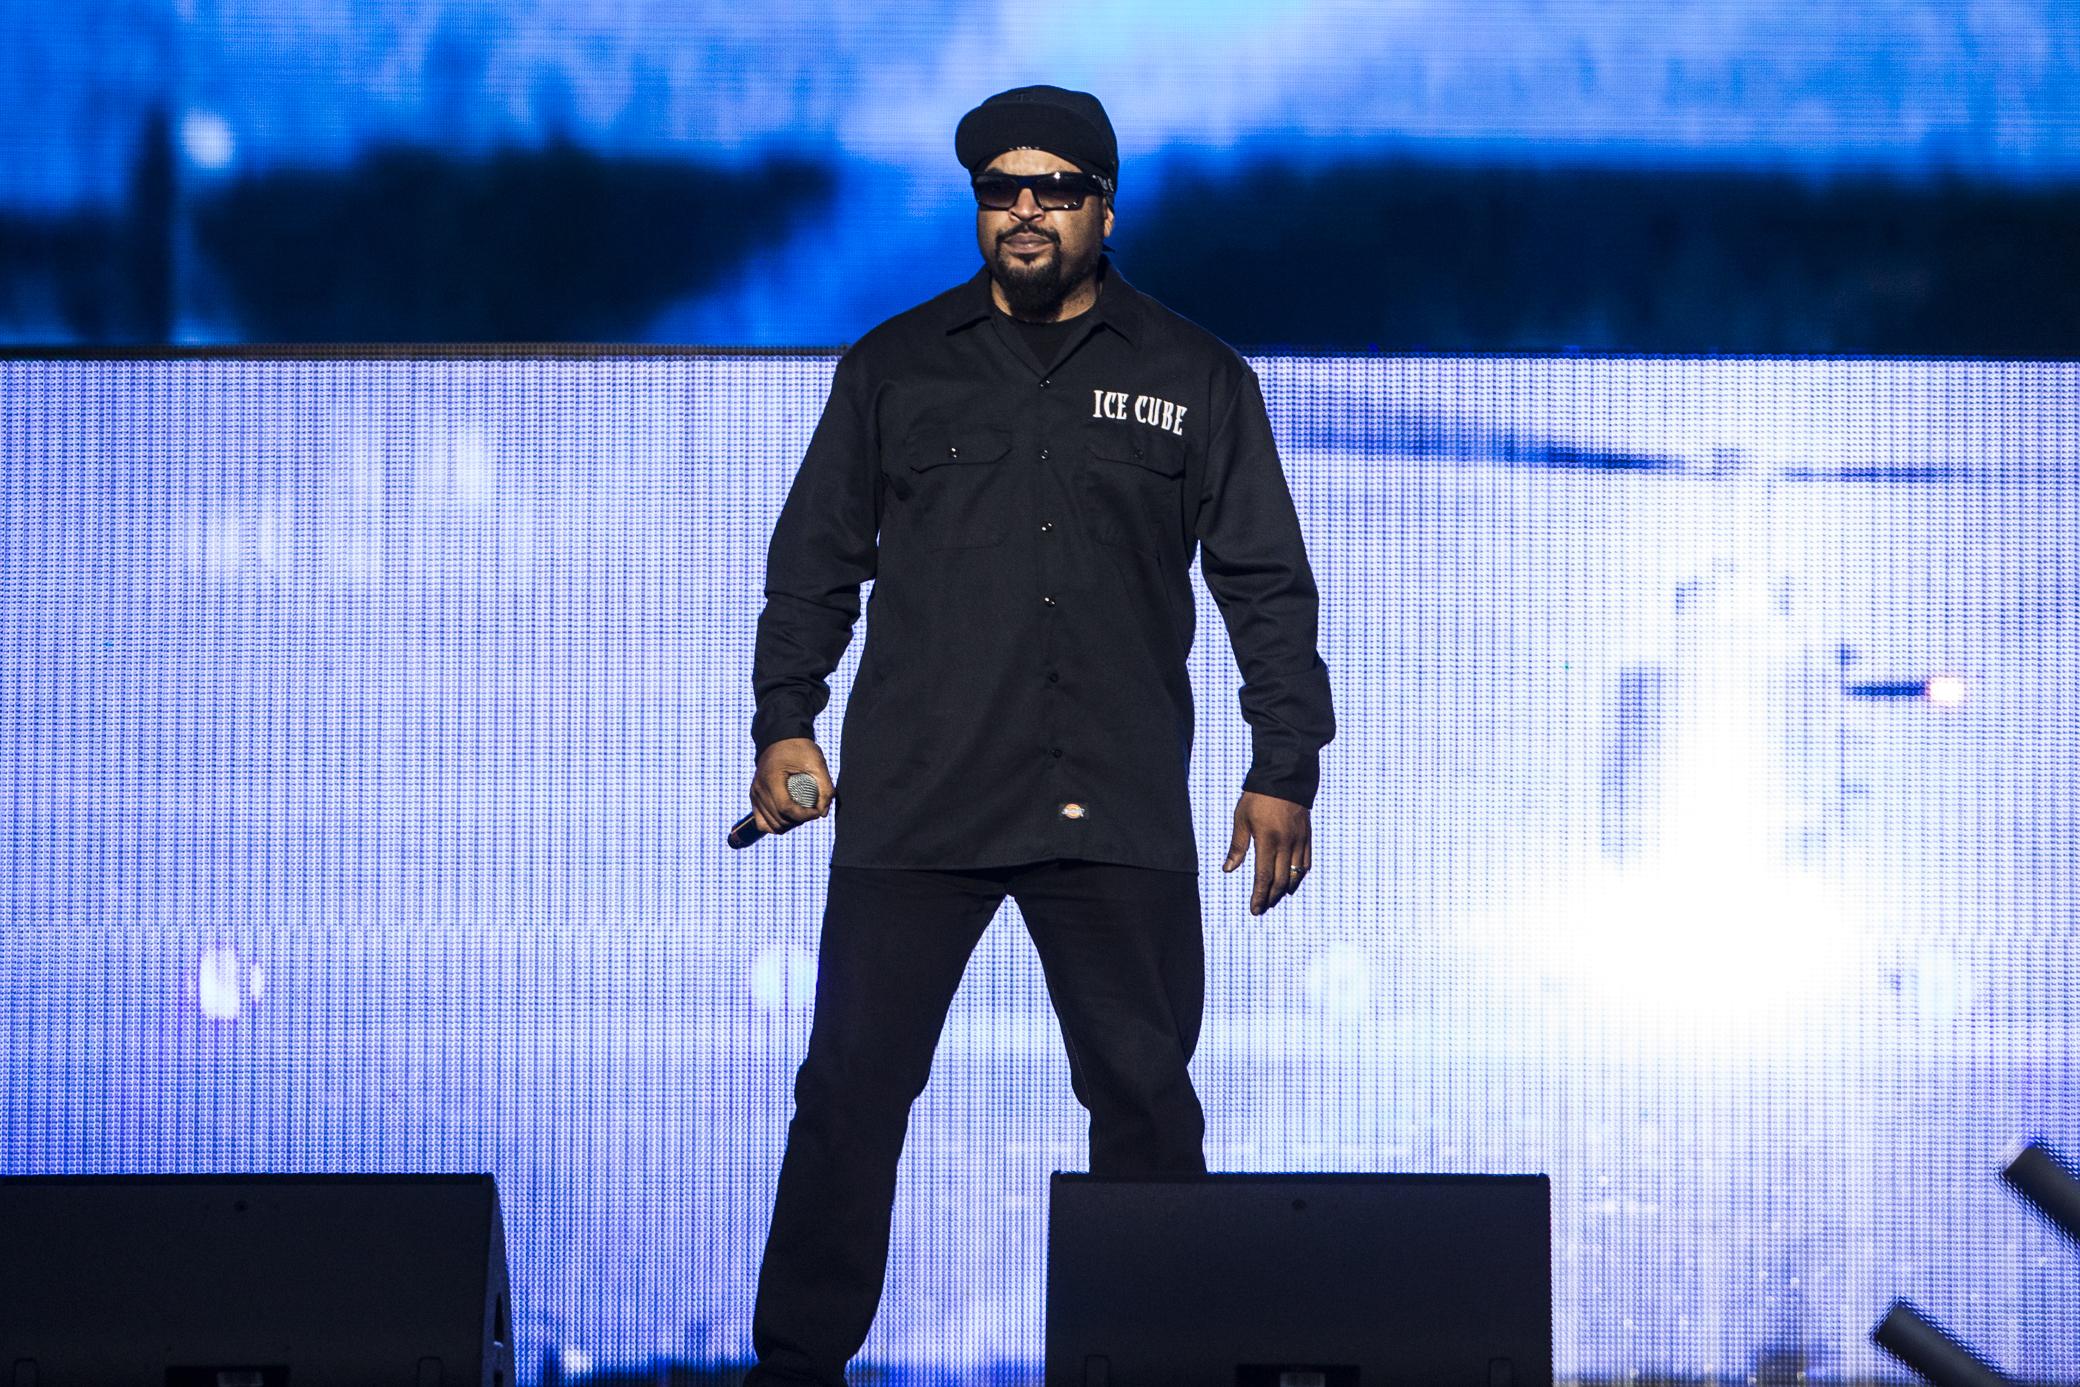 ice cube 2 Ice Cube.2